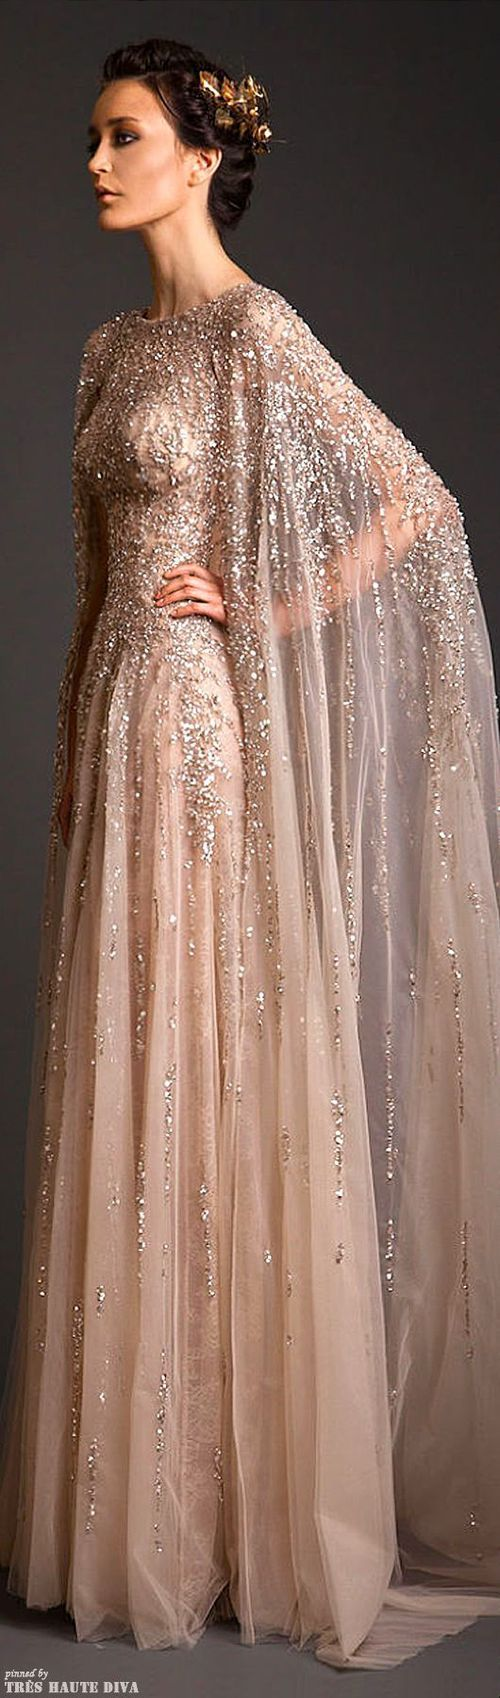 Such a gorgeous design